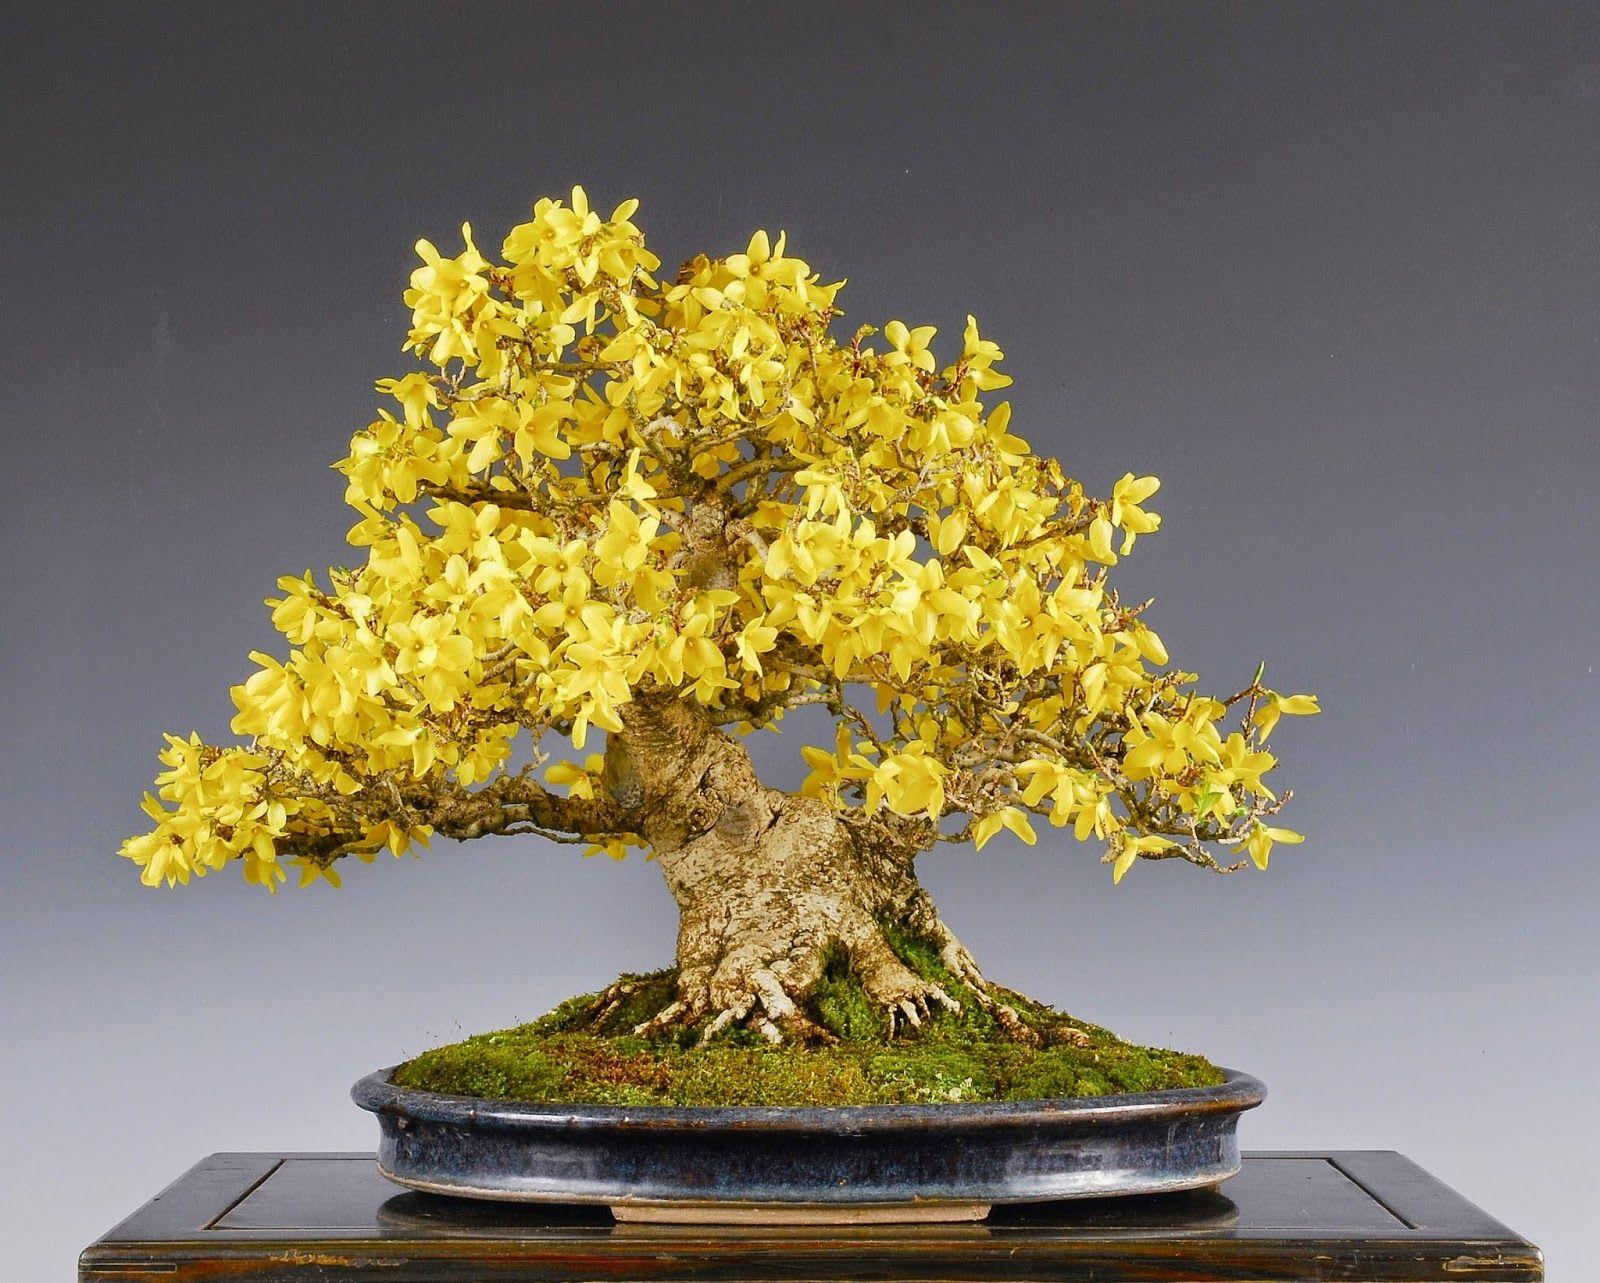 Bonsai jasm n de floraci n invernal c mo cultivar un - Como cultivar bonsai ...